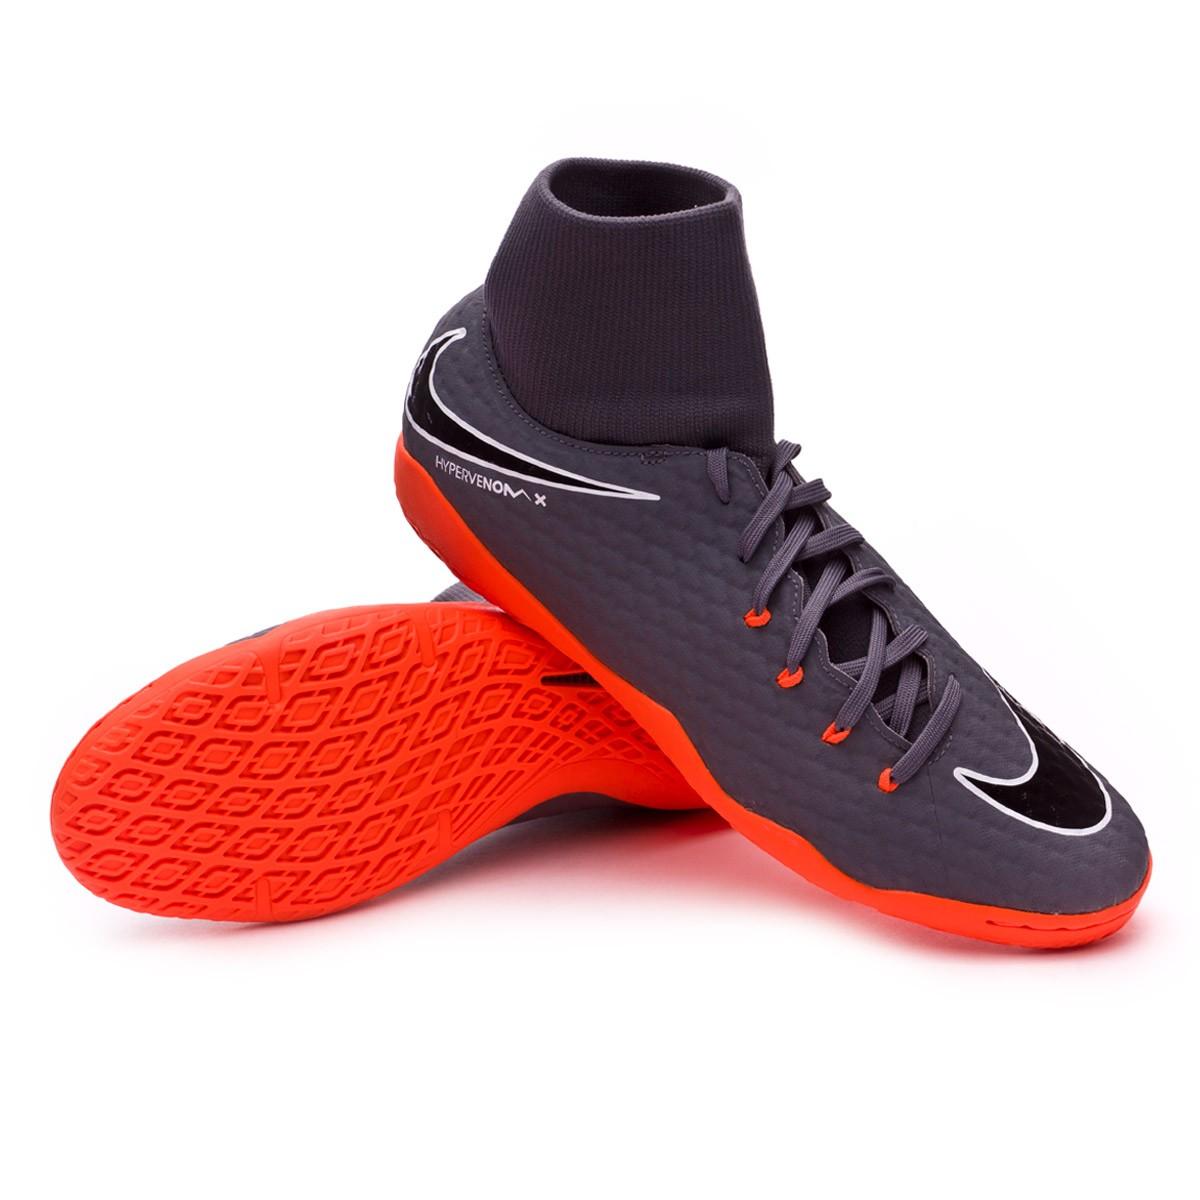 a886bd5b0c0e Futsal Boot Nike Hypervenom PhantomX III Academy DF IC Dark grey ...